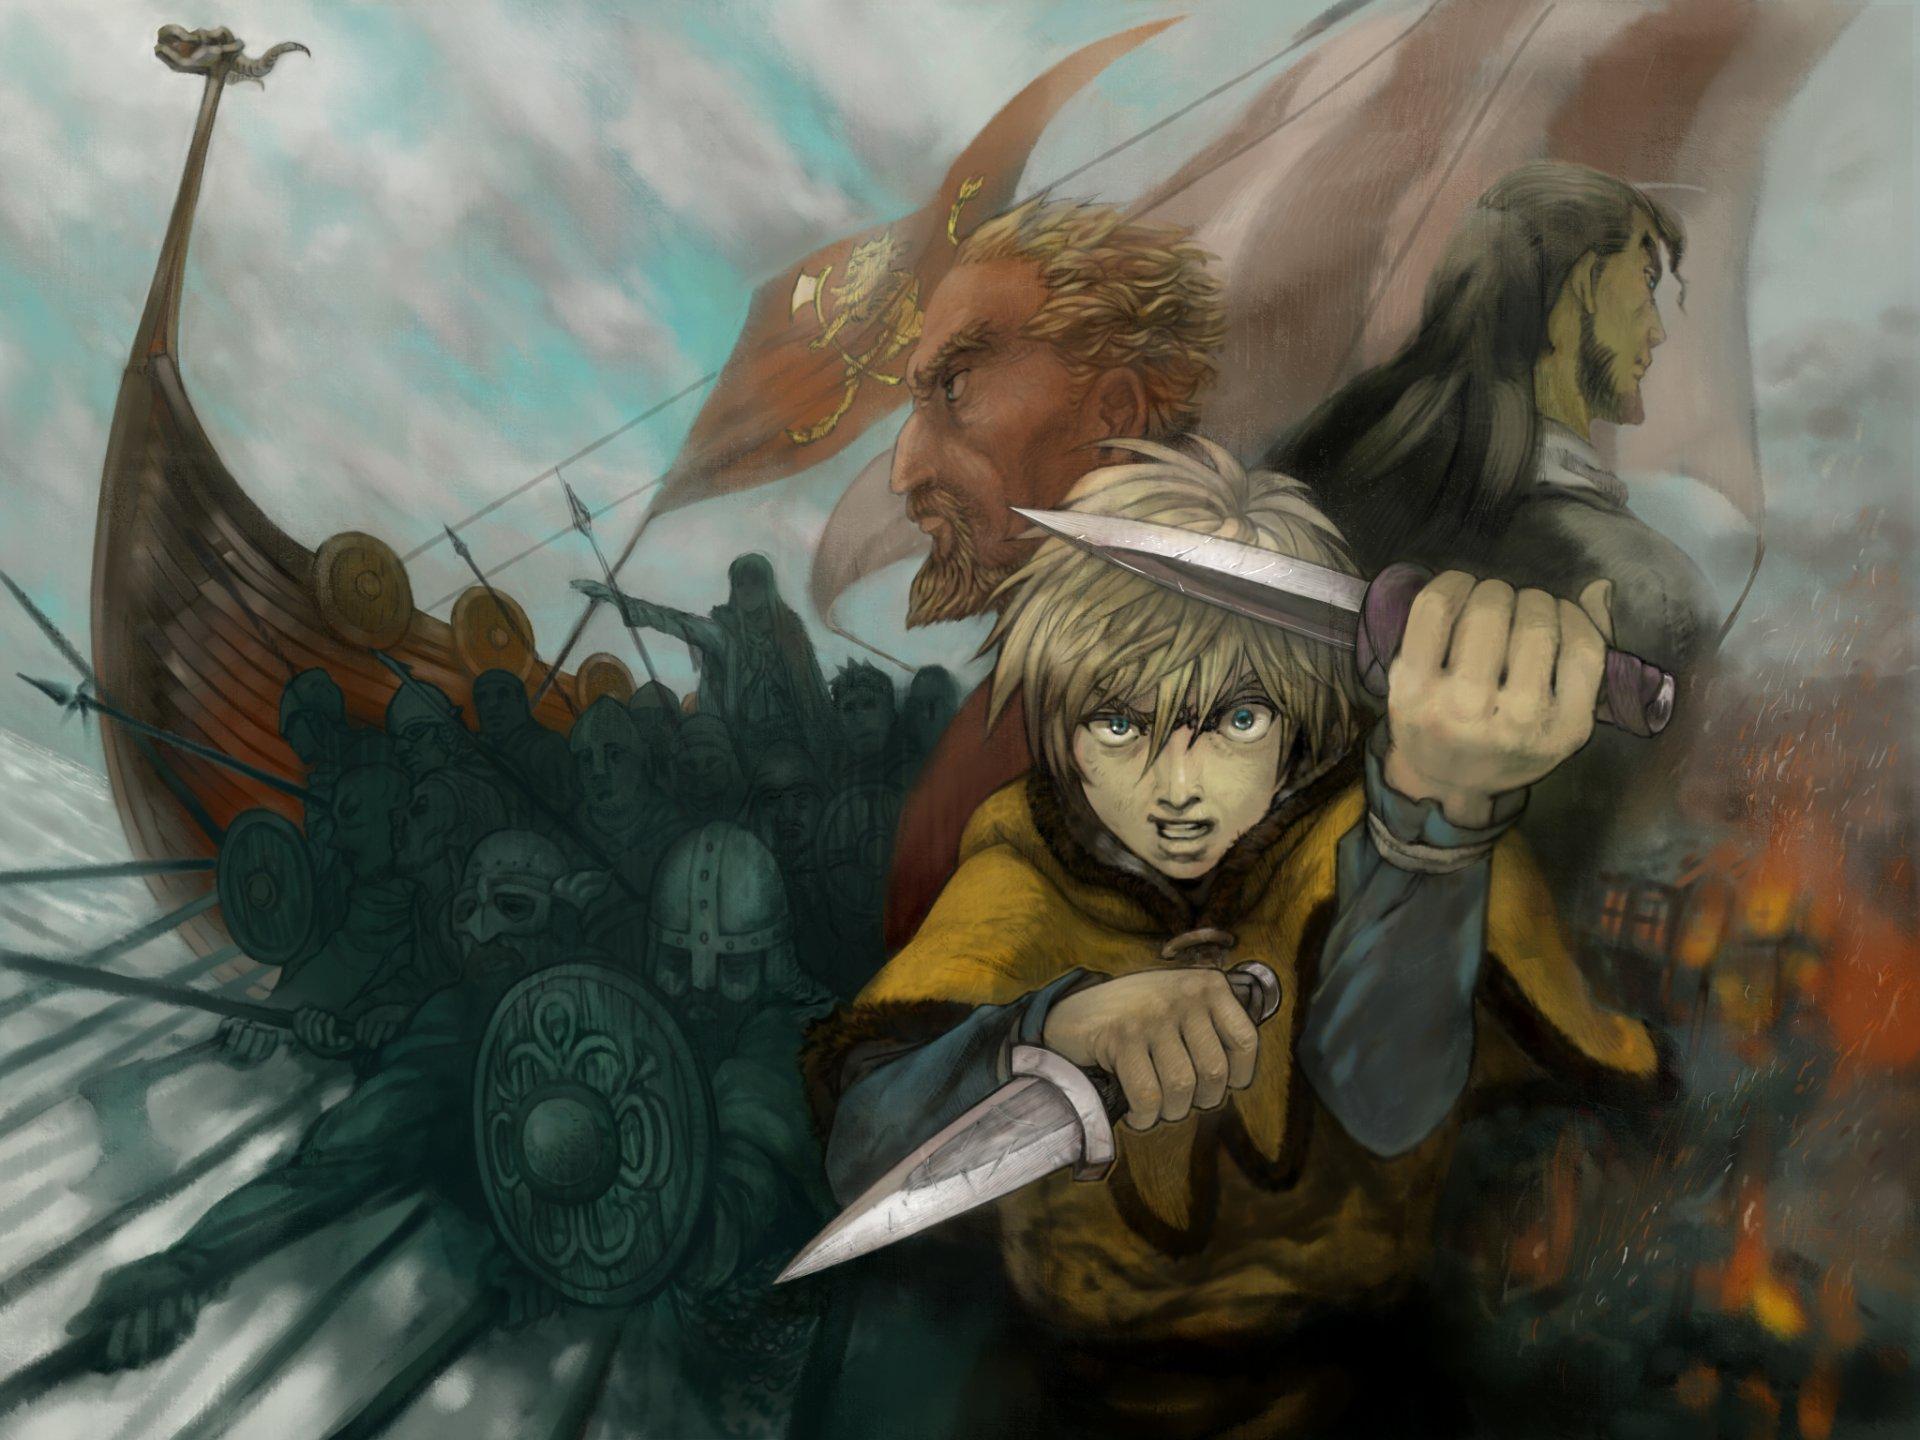 Vinland Saga HD Wallpaper   Background Image   2048x1536 ...